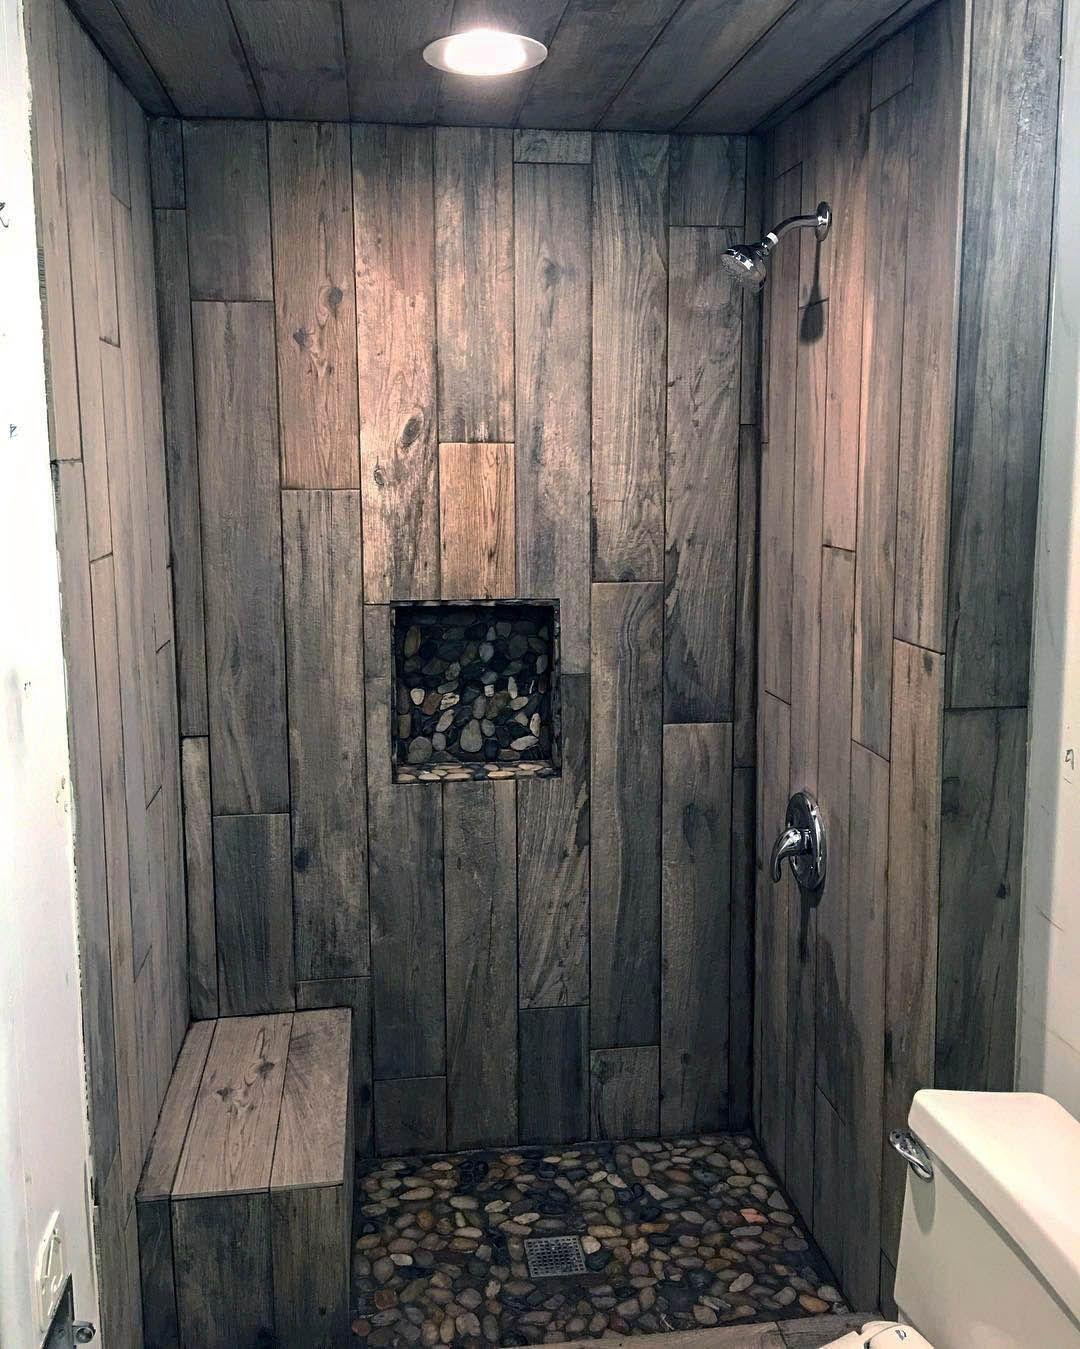 New Bathroom Shower Tile Ideas White Exclusive On Smart Home Decor Rustic Bathroom Shower Luxury Bathroom Shower Bathroom Shower Design